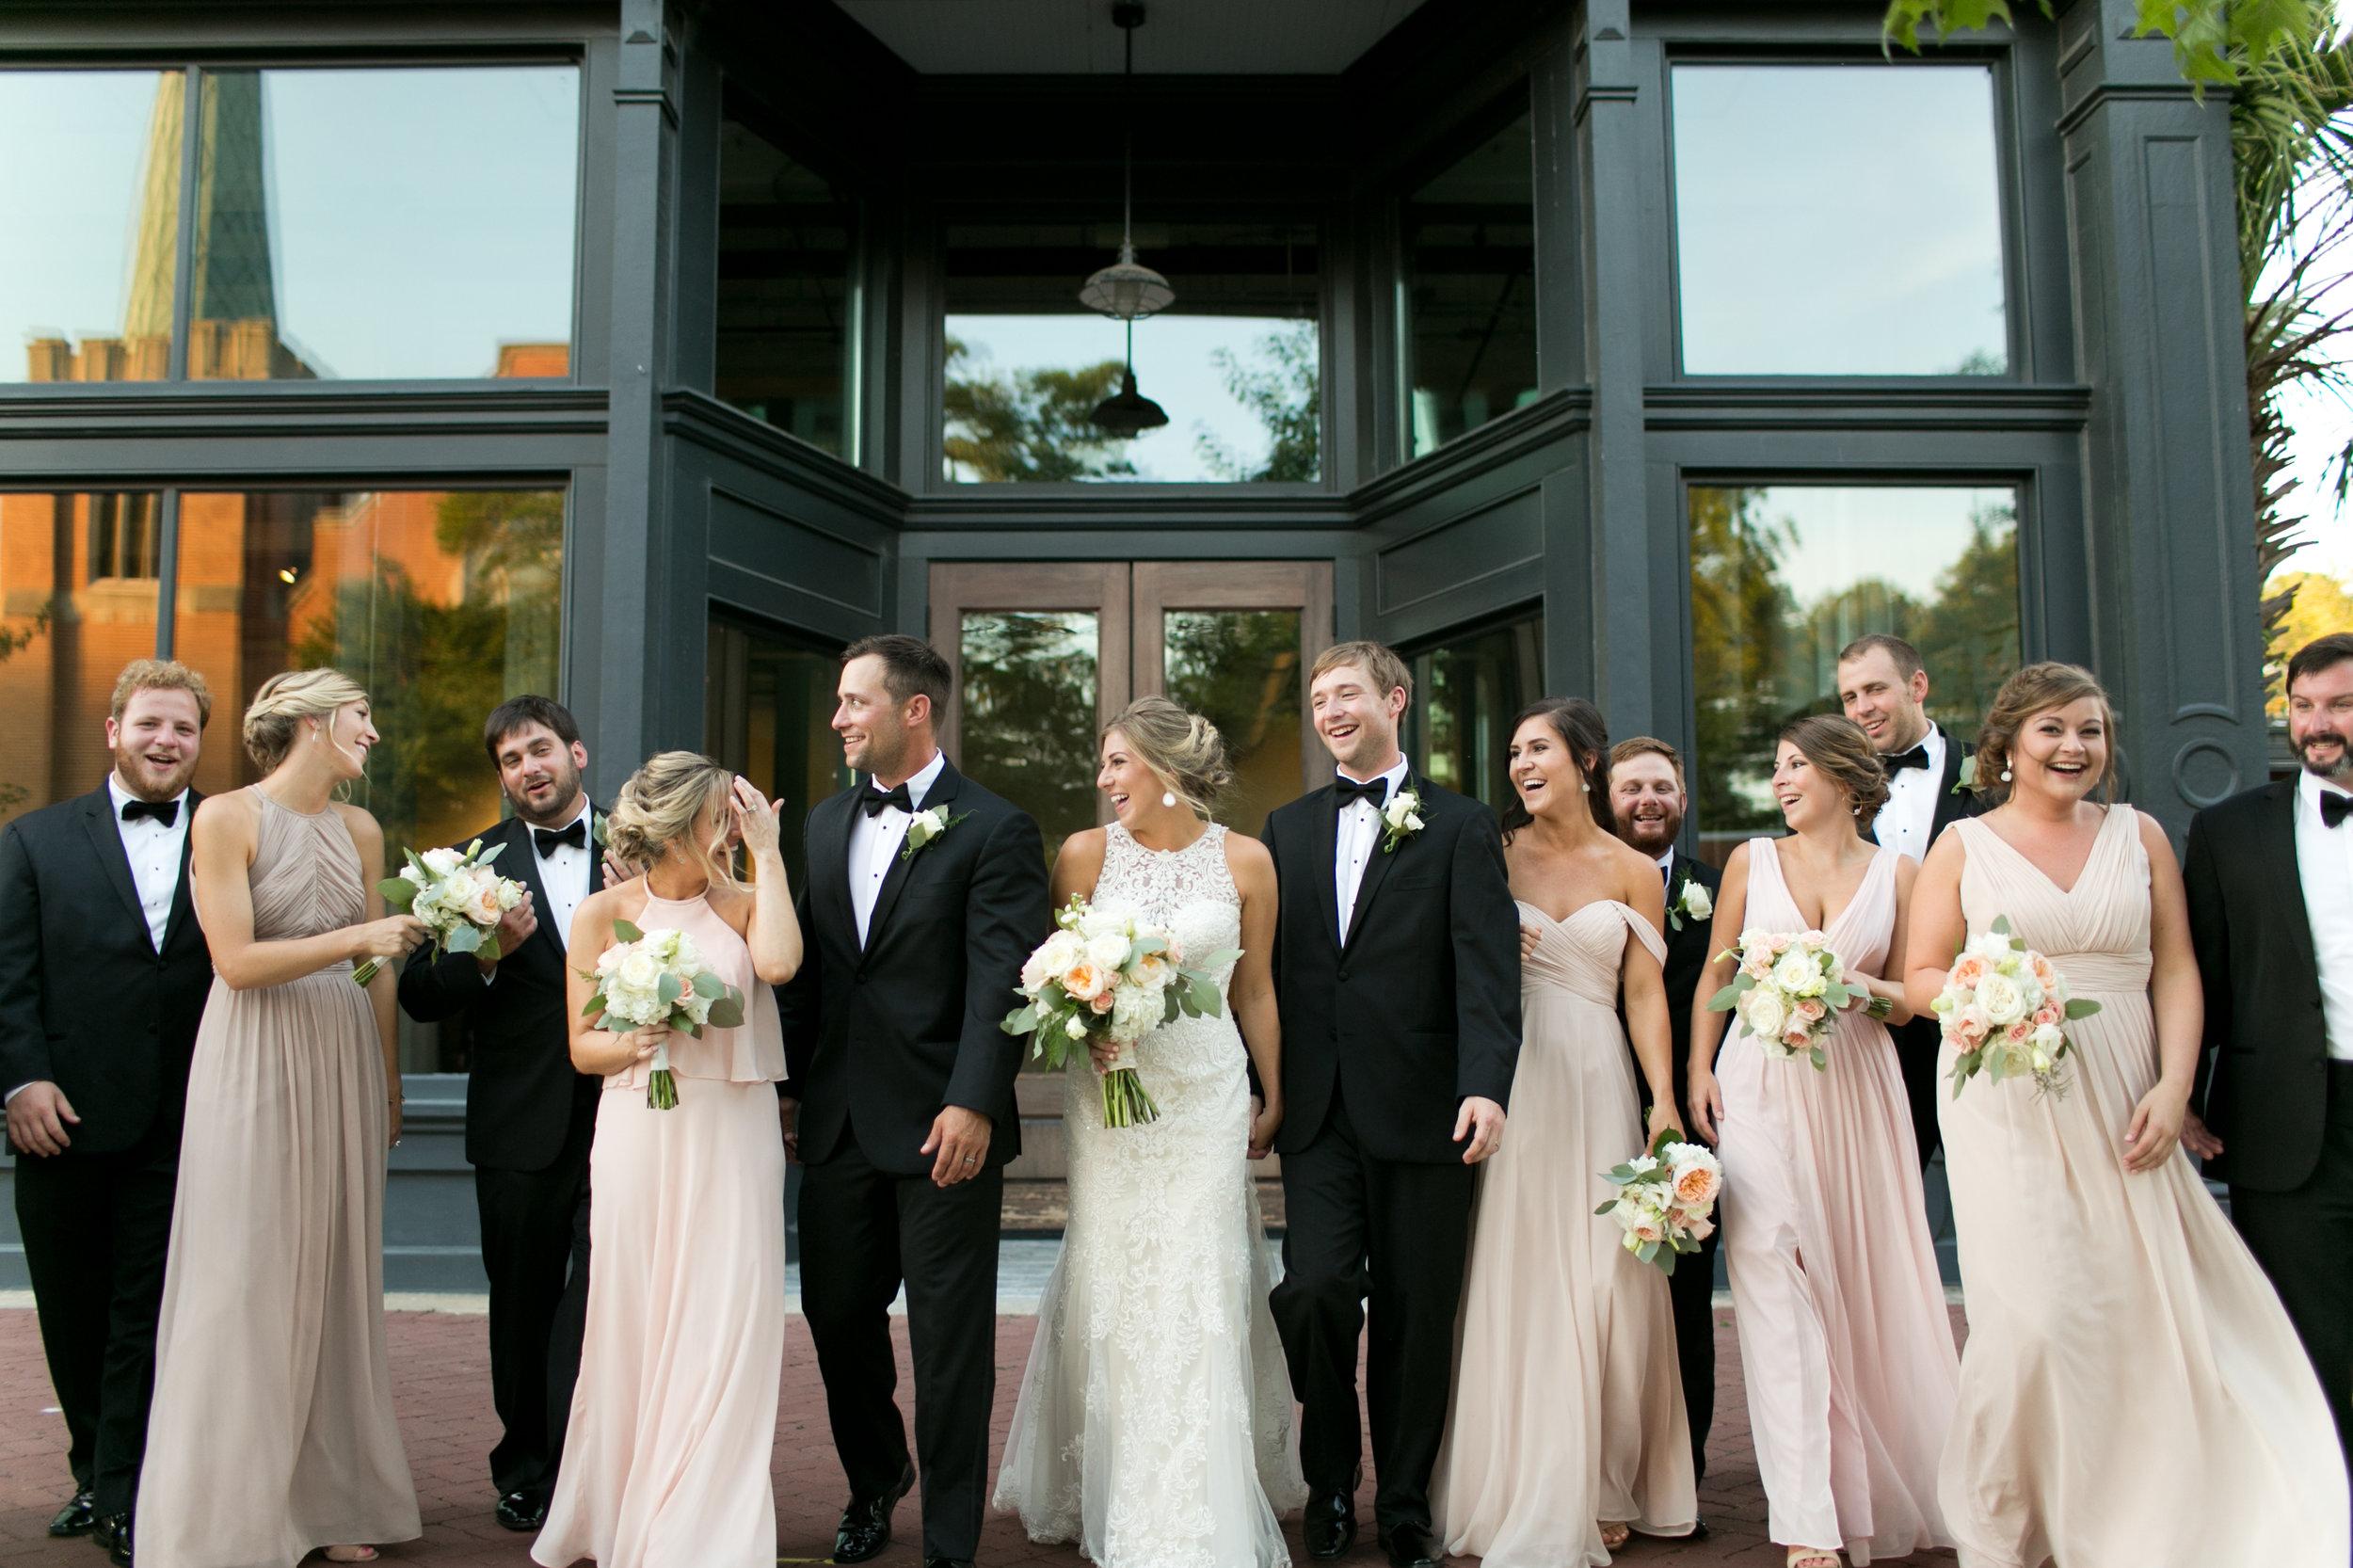 701_whaley_wedding_36.jpg